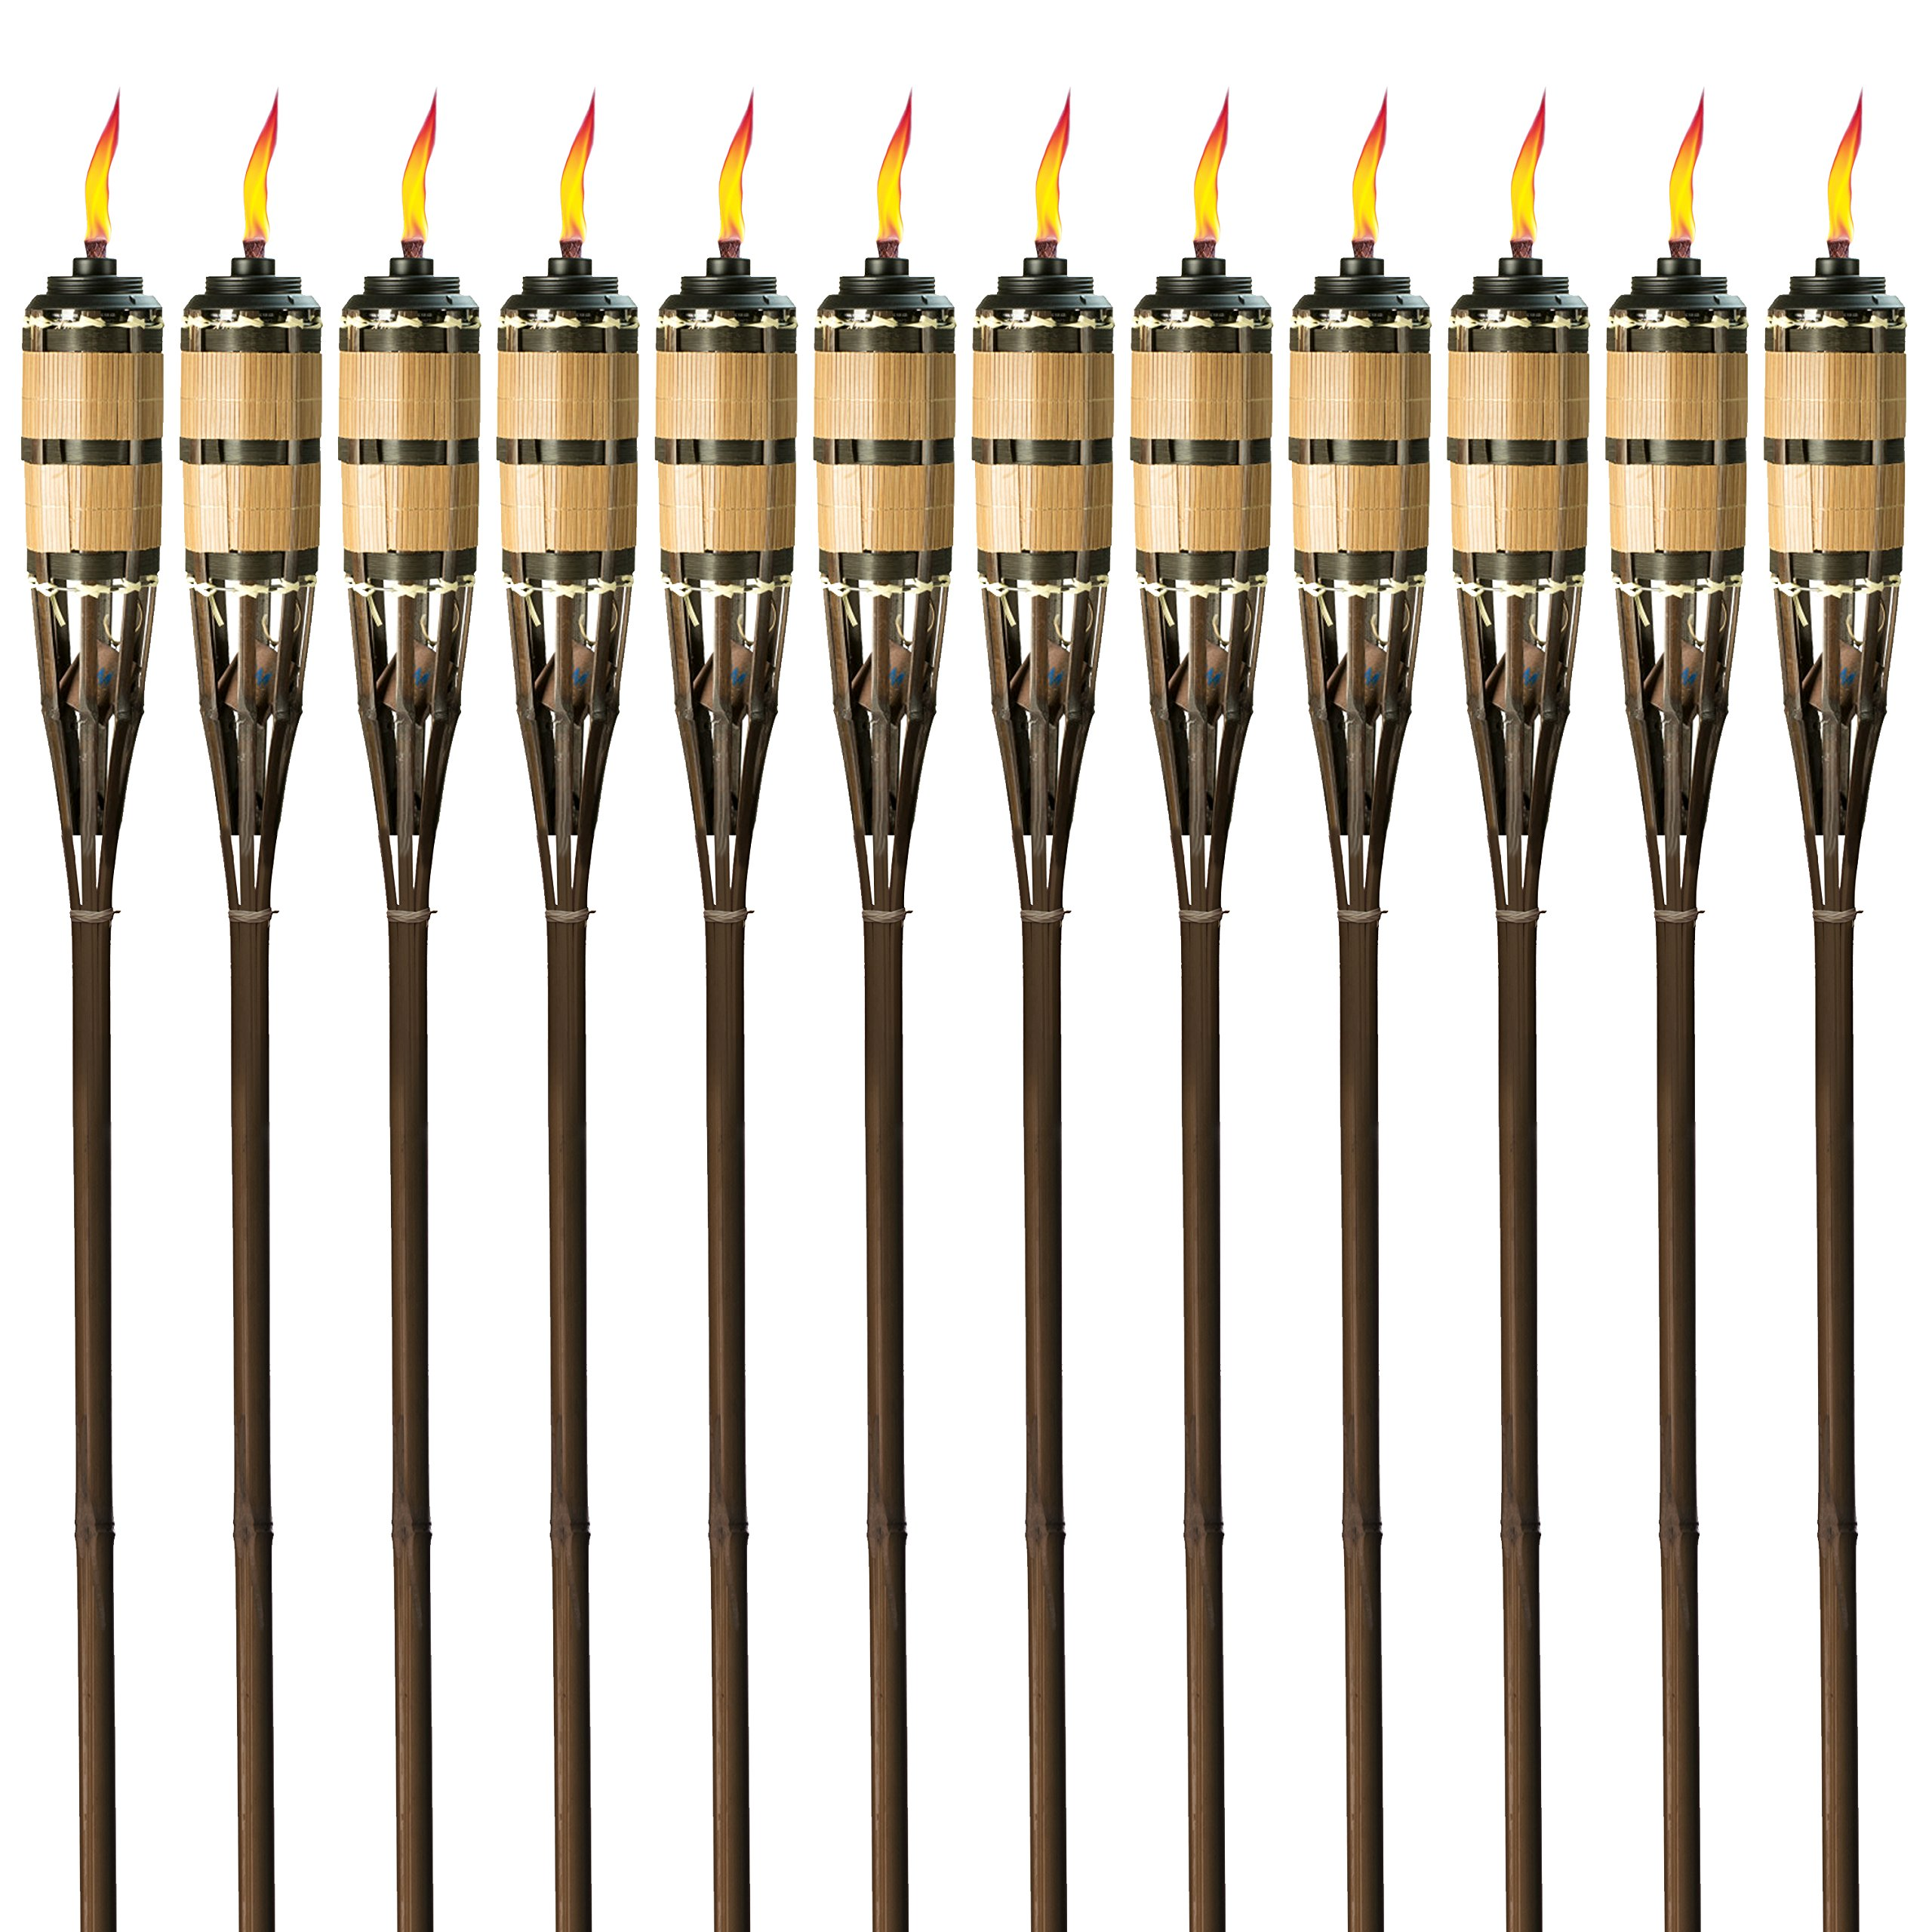 Tiki Brand 1117071 Cypress Brown 12-Pack Torch, 60-Inch, Bamboo by Tiki